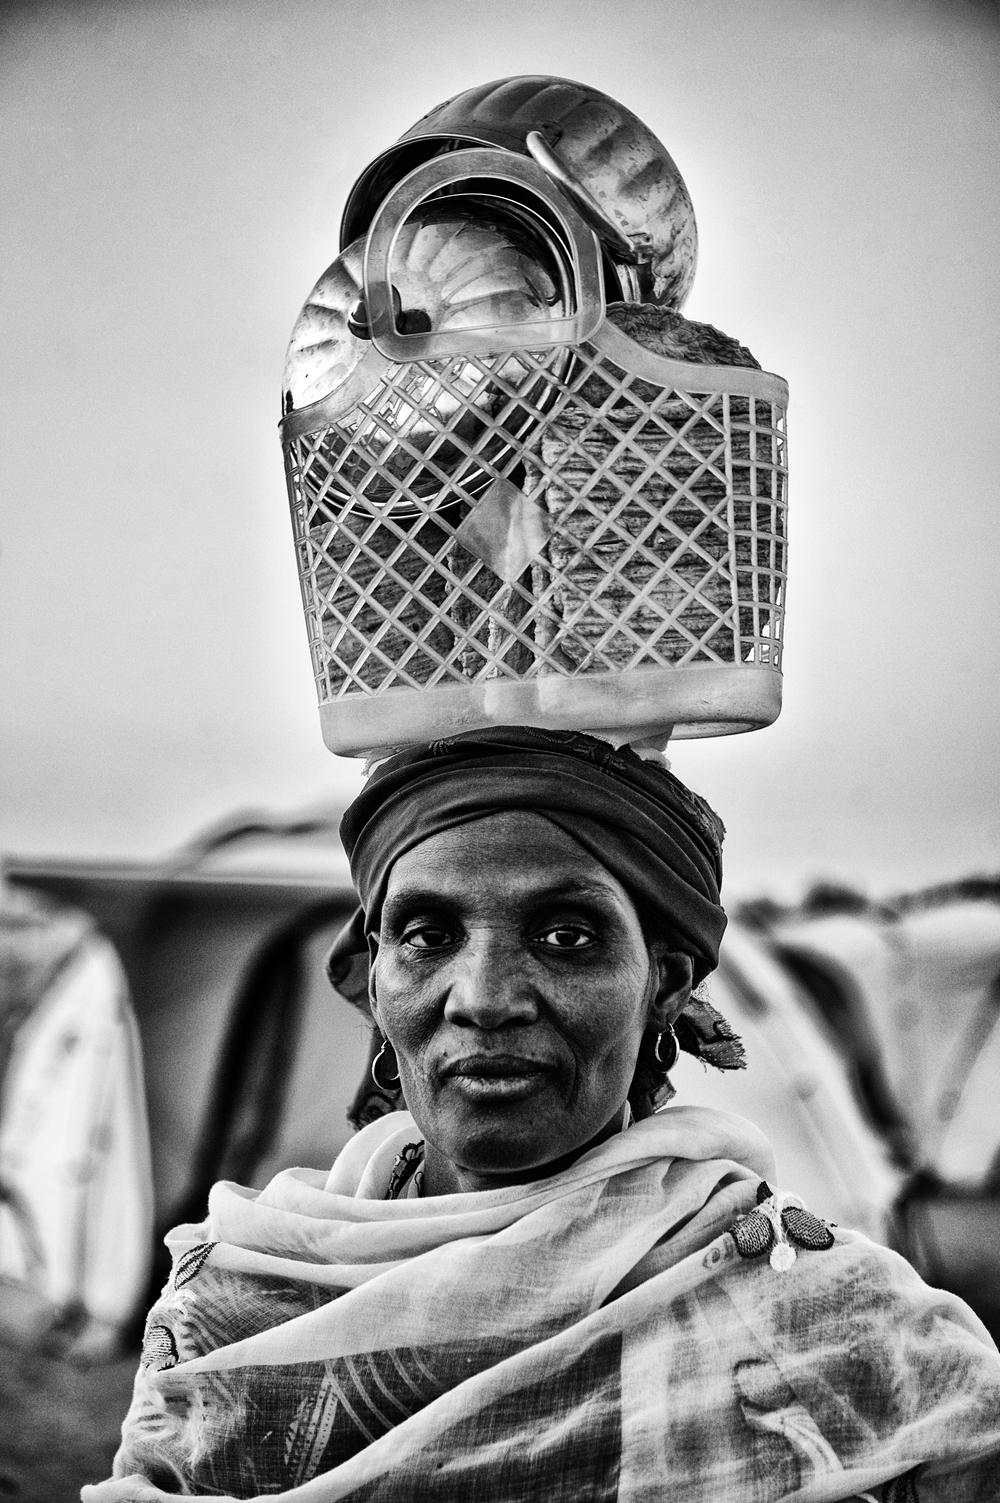 Tuareg Niger